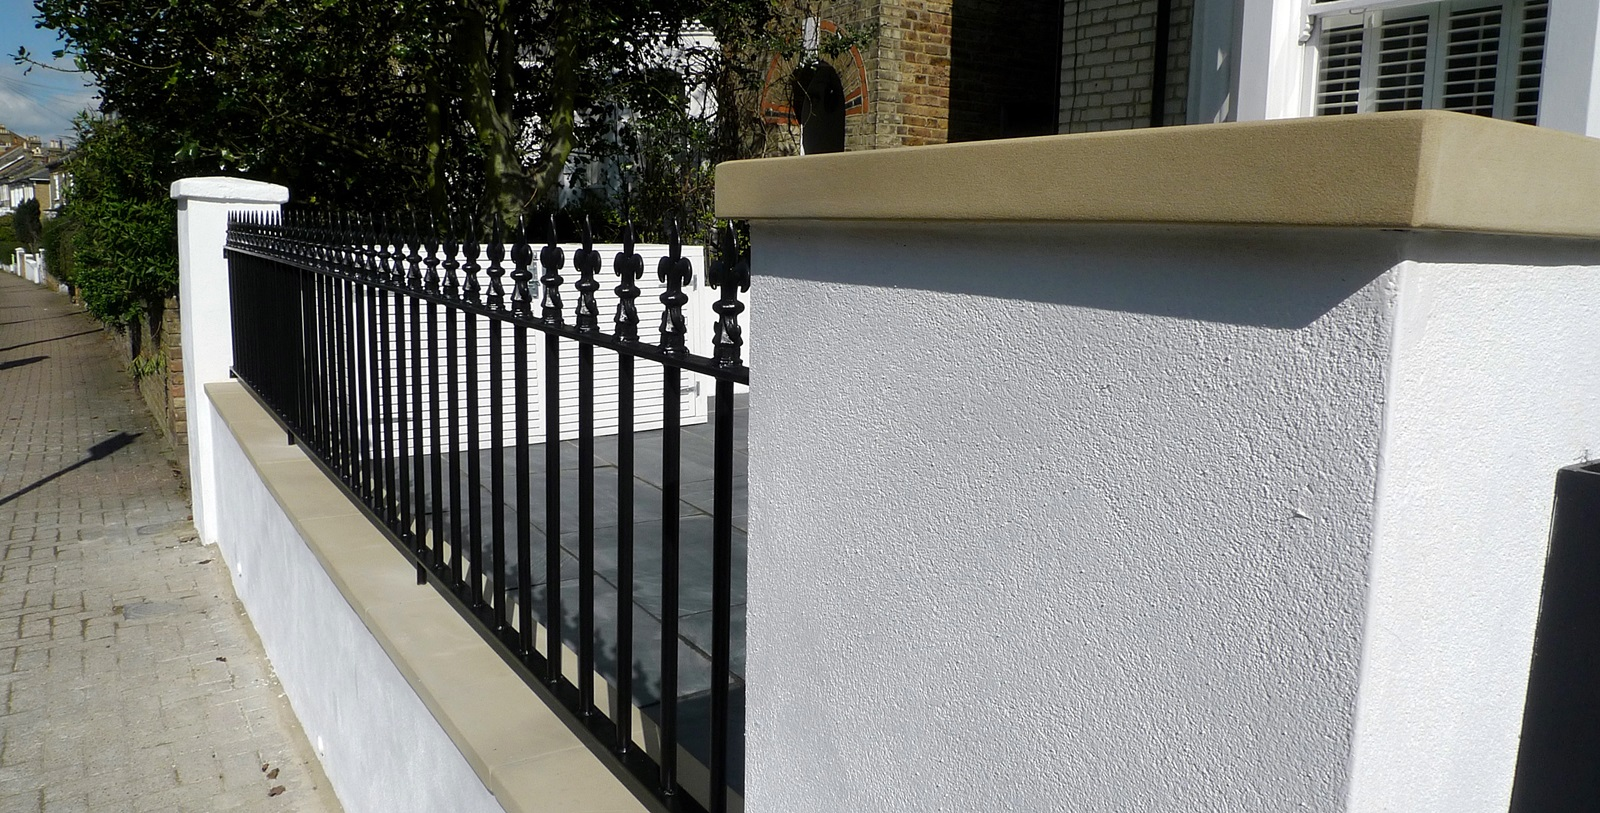 Front garden wall rail gate Victorian mosaic slate paving bespoke bin store York stone caps Balham Clapham Dulwich Tooting London (3)